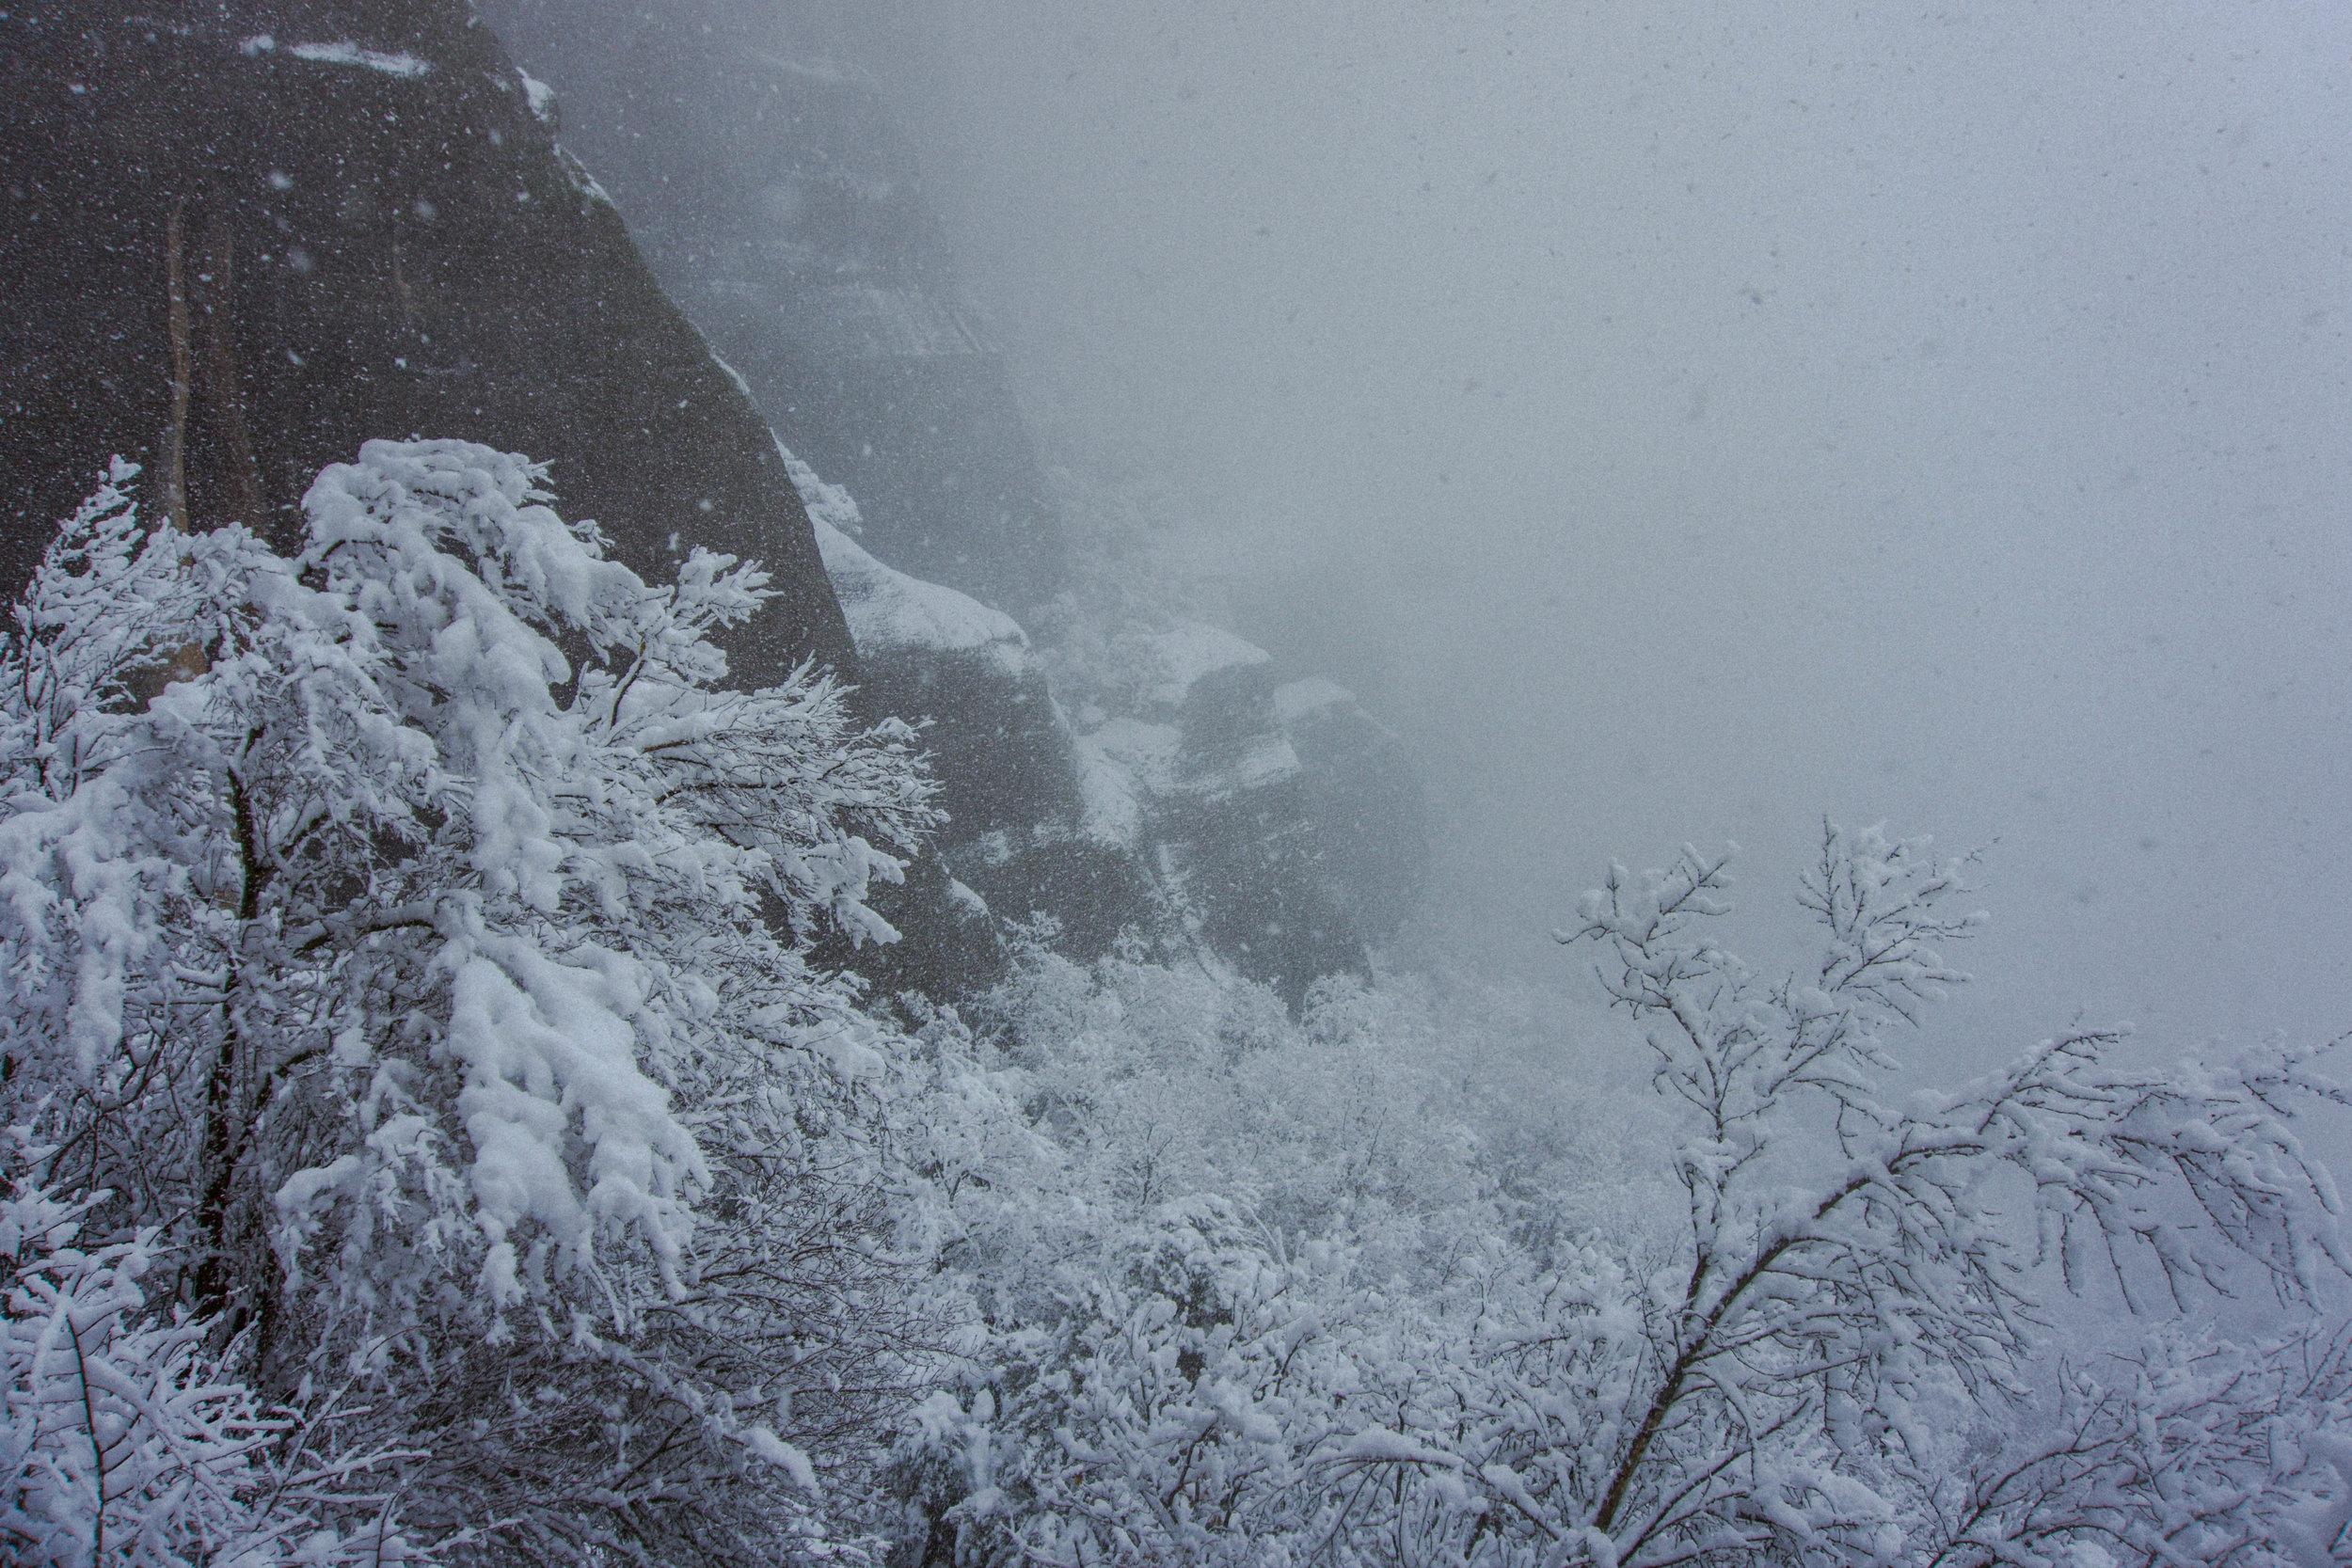 Meteora_09_Winterwind.JPG